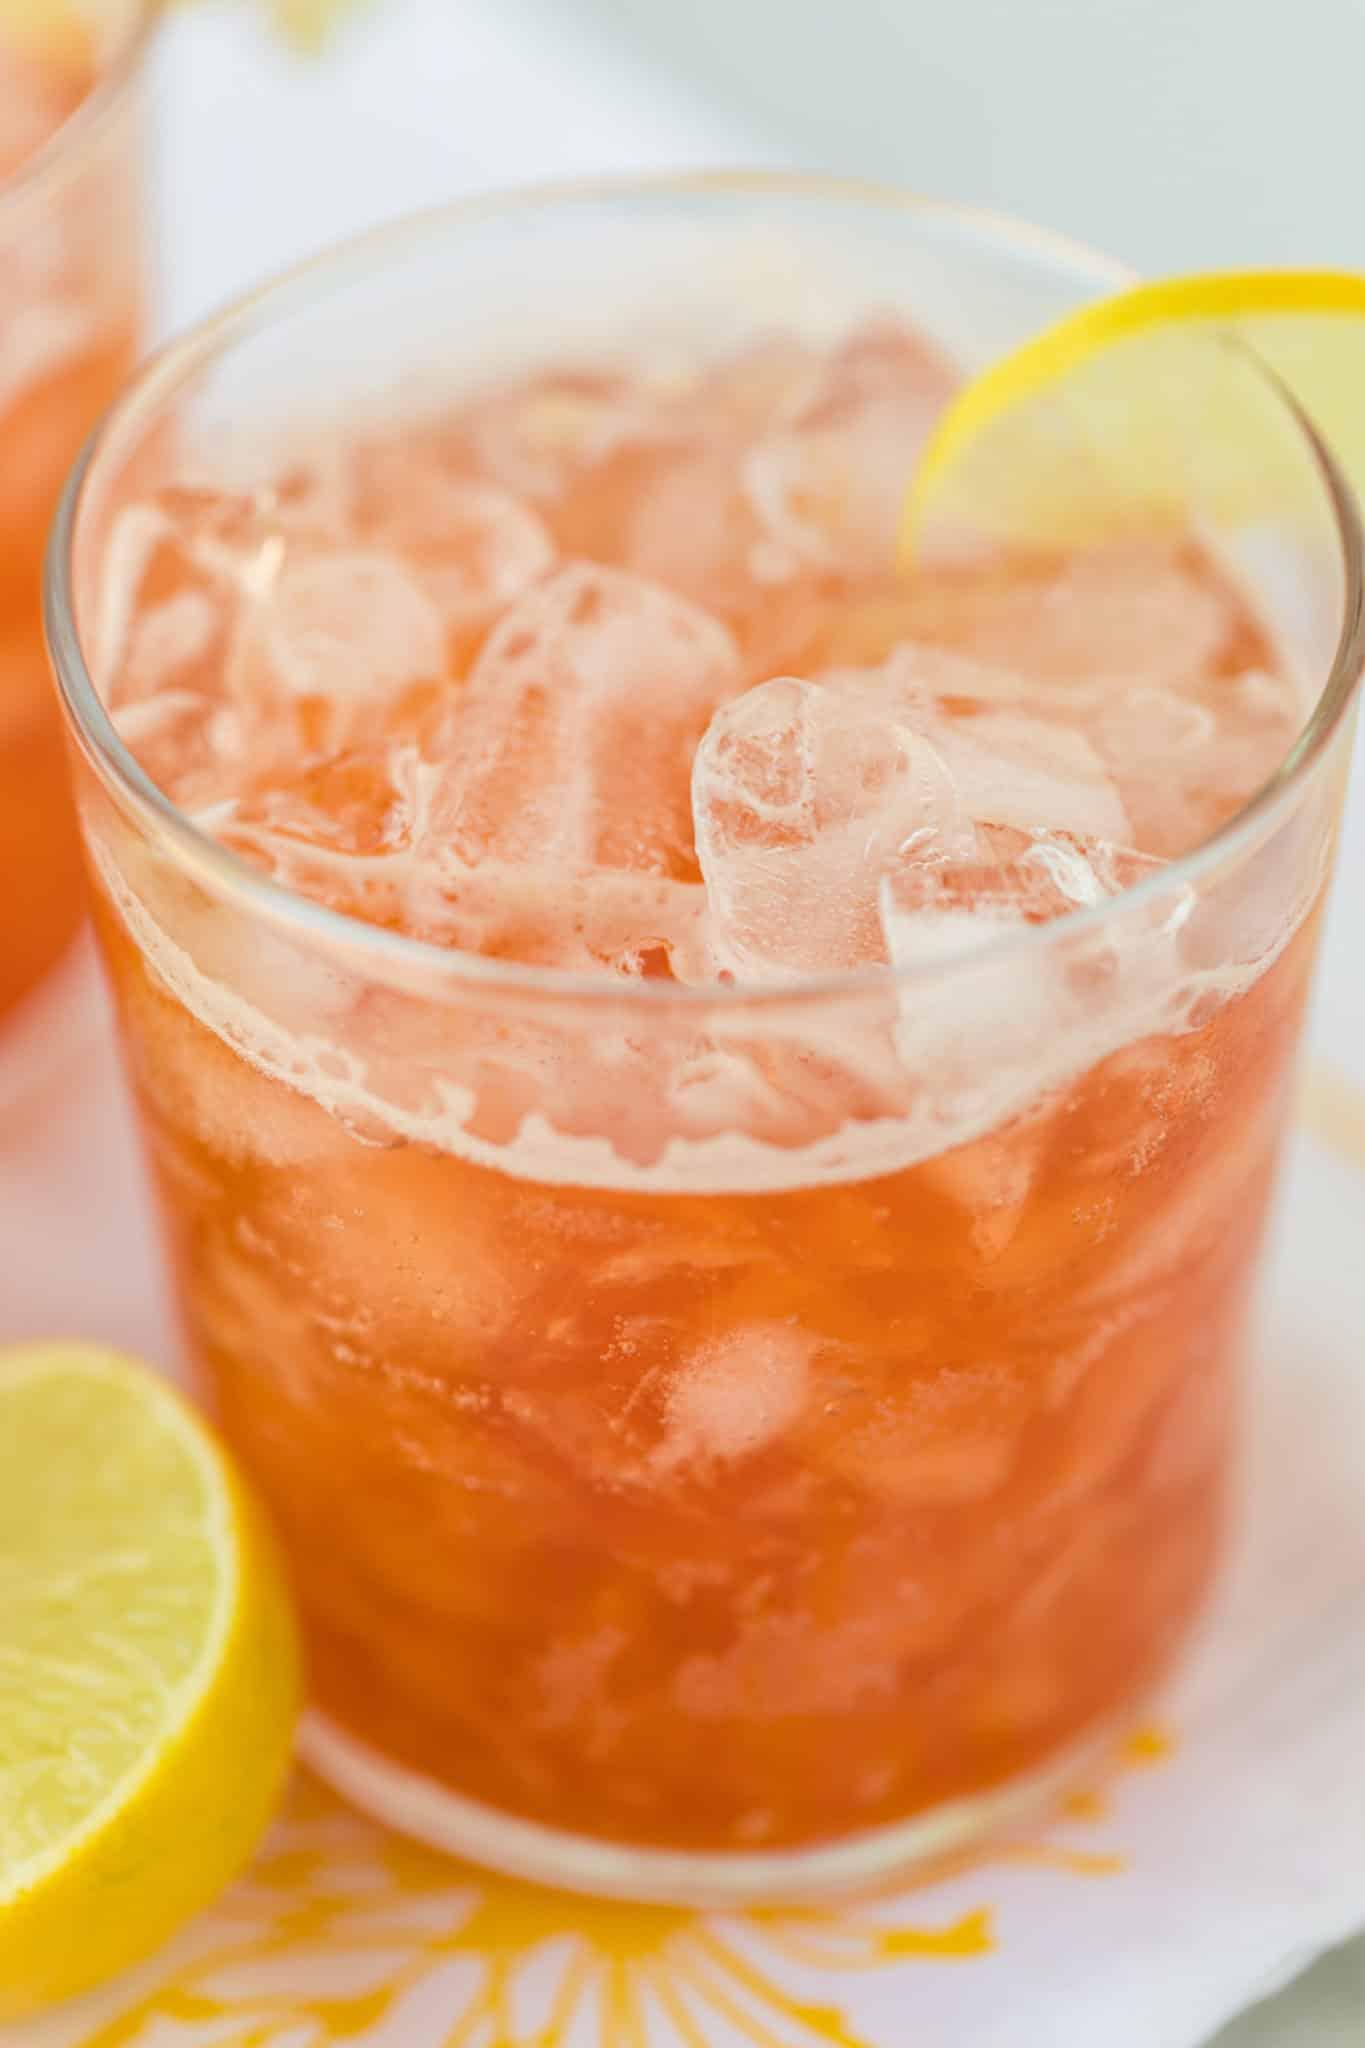 glass of kombucha lemonade with crushed ice